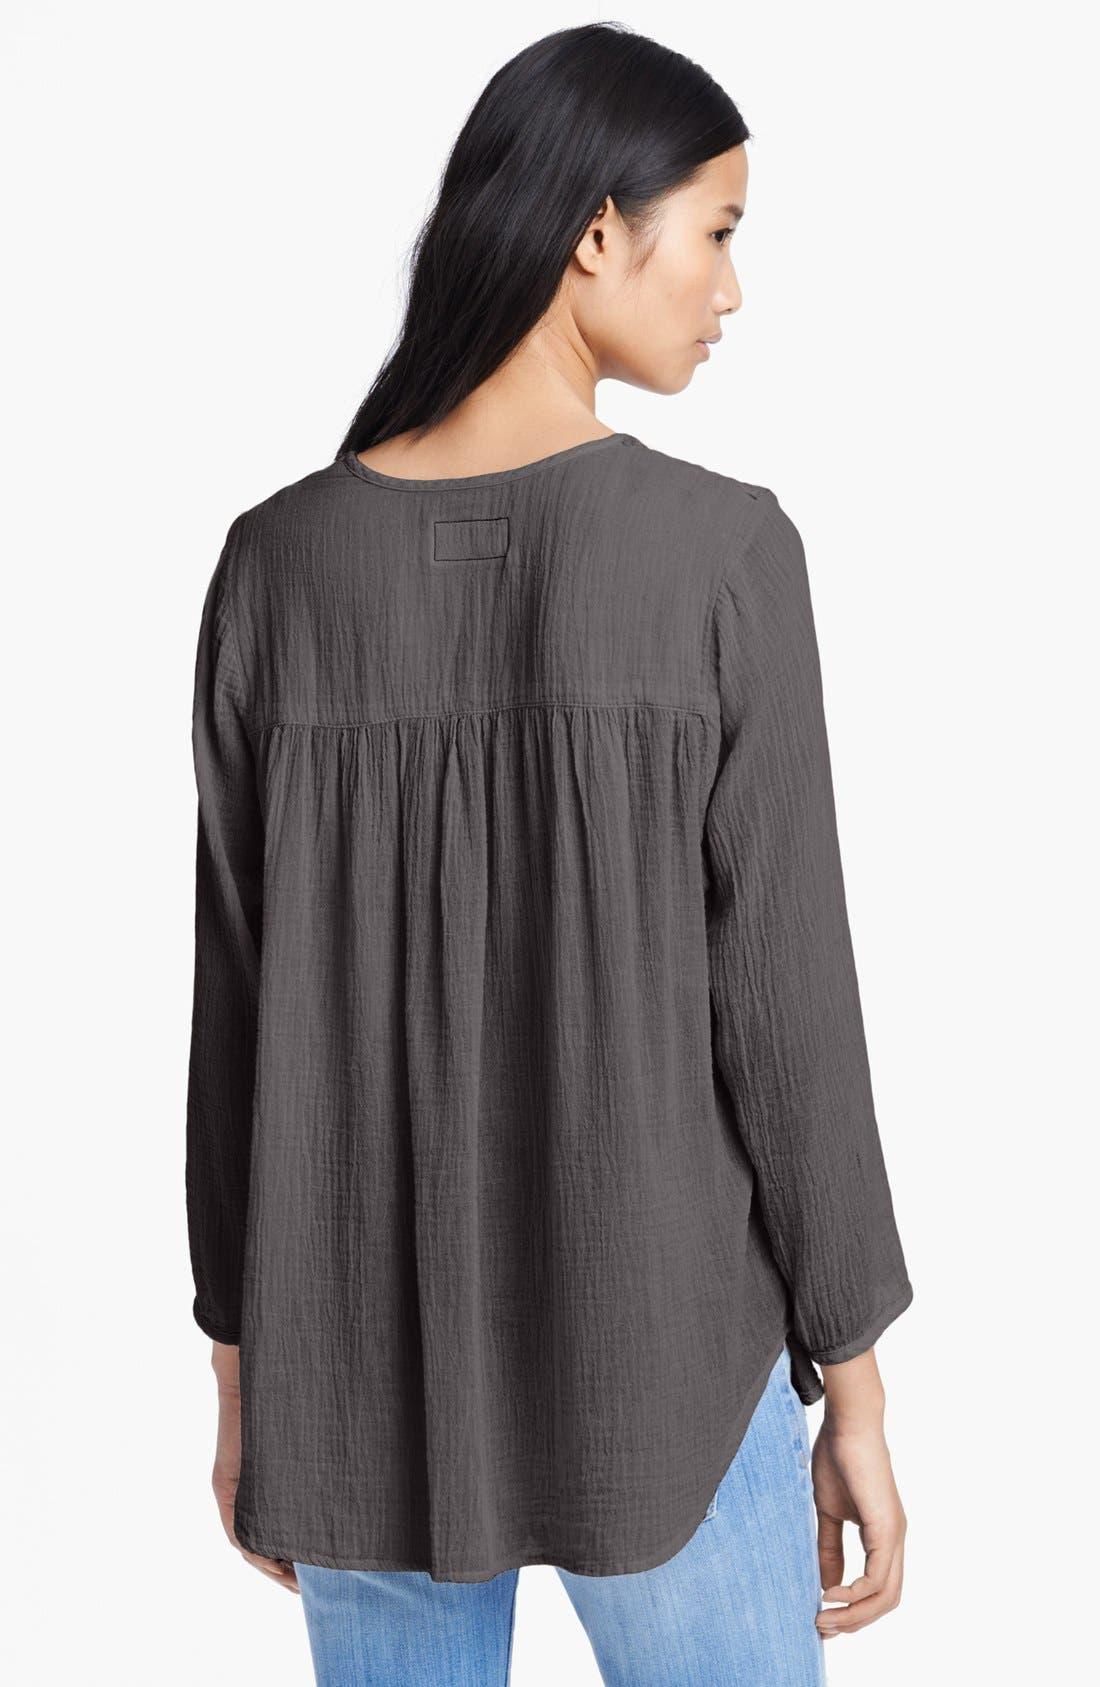 Alternate Image 2  - Current/Elliott 'The Picnic Shirt' Crochet Detail Top